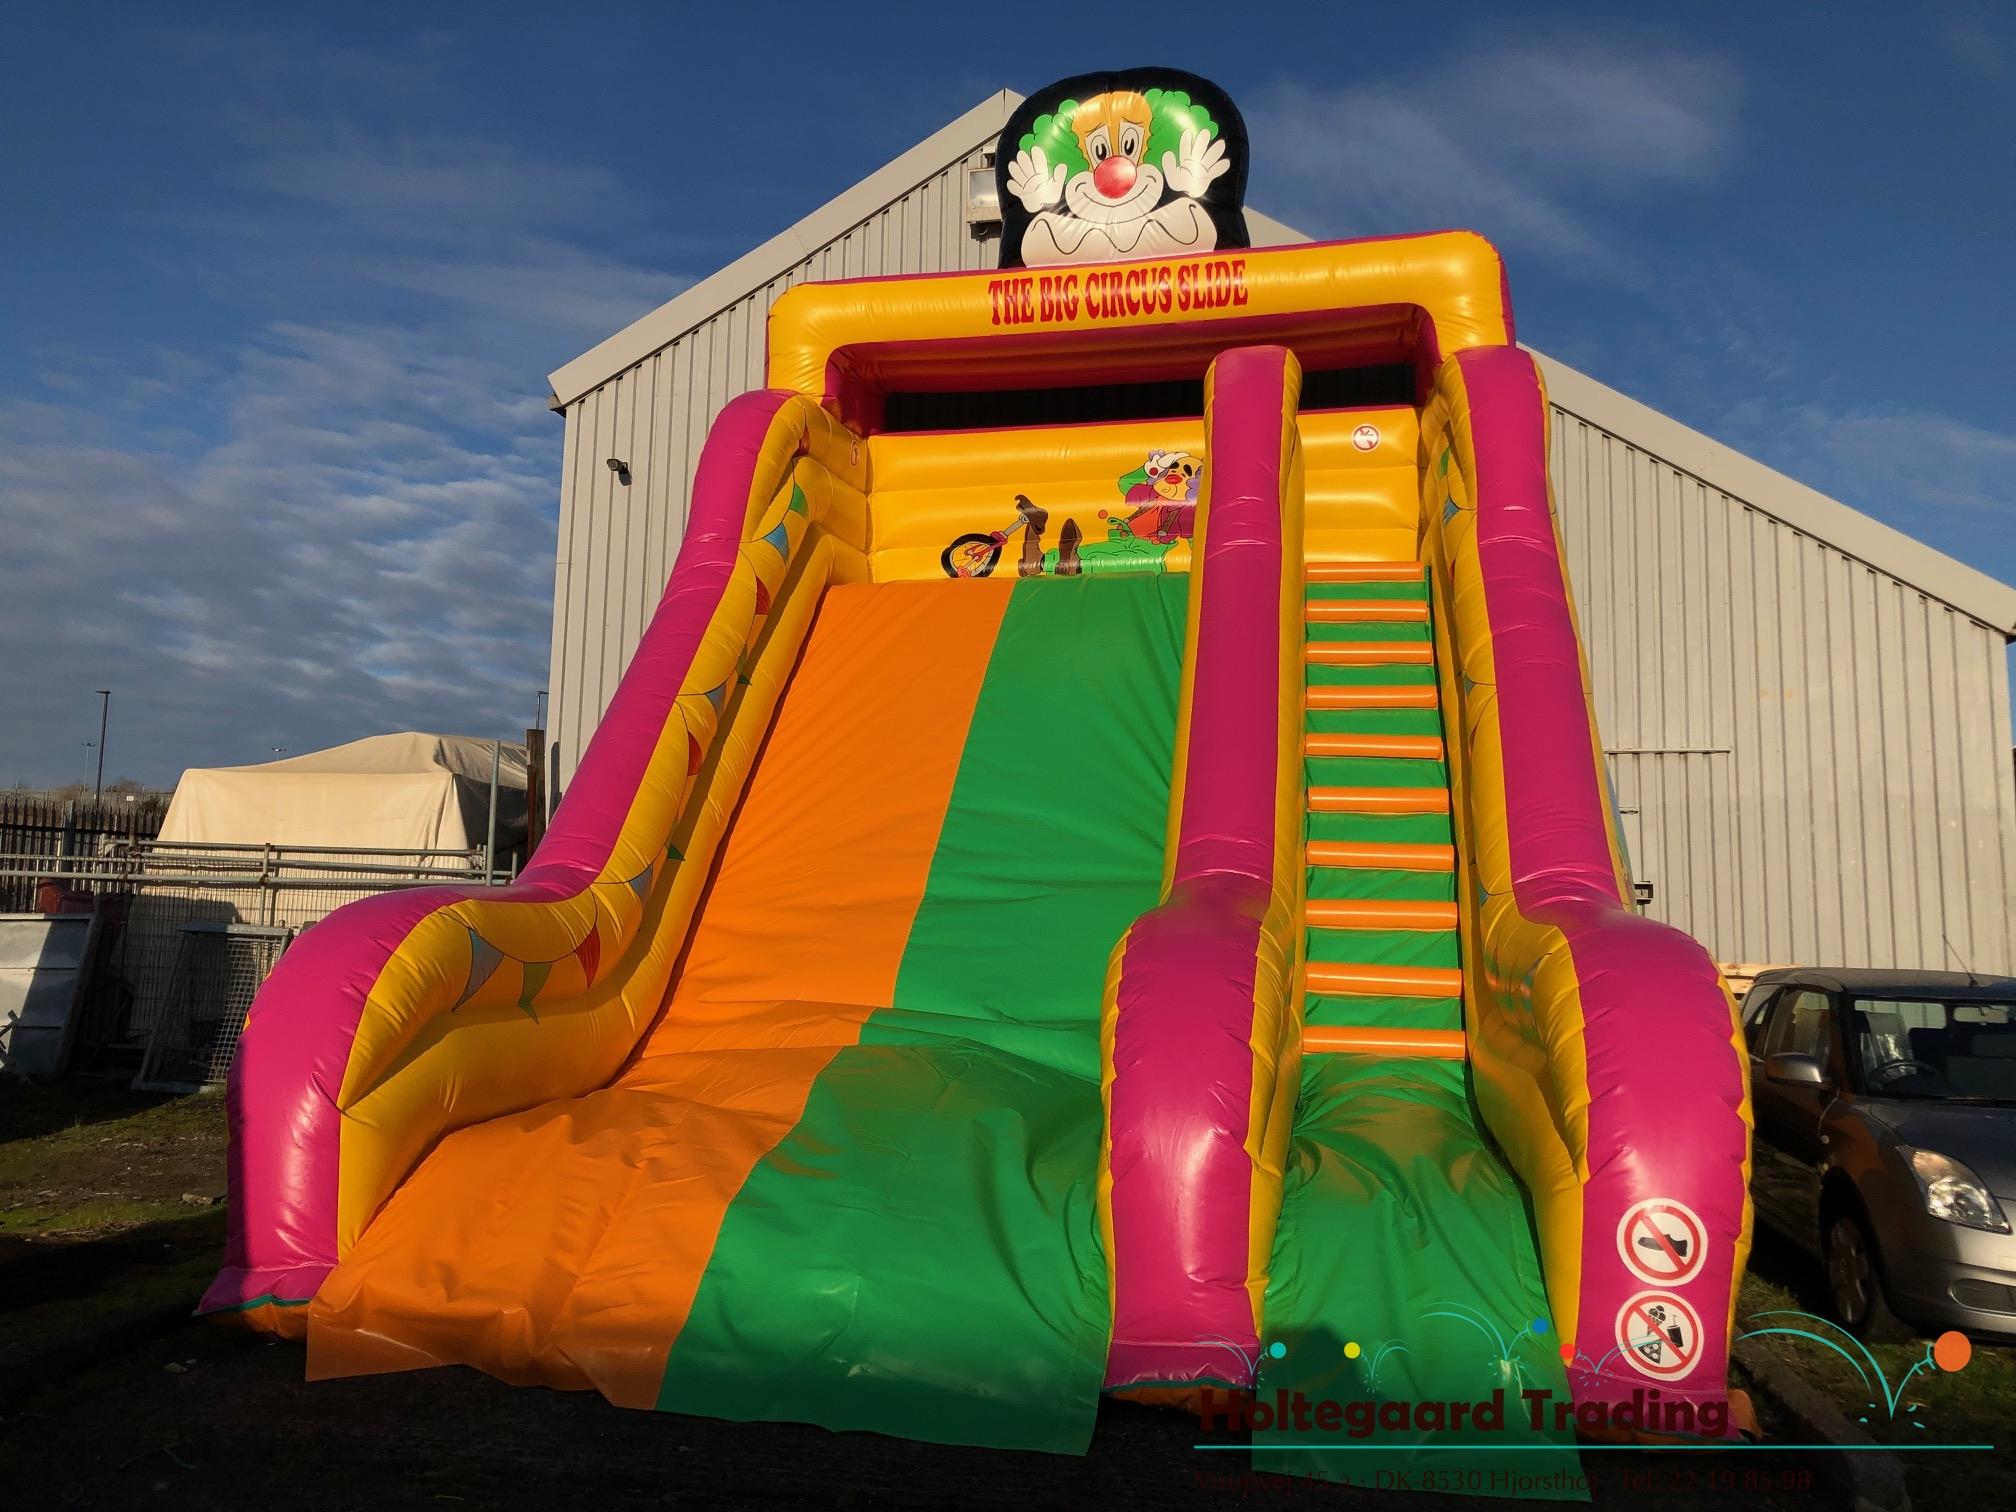 Cirkus slide i stor størrelse